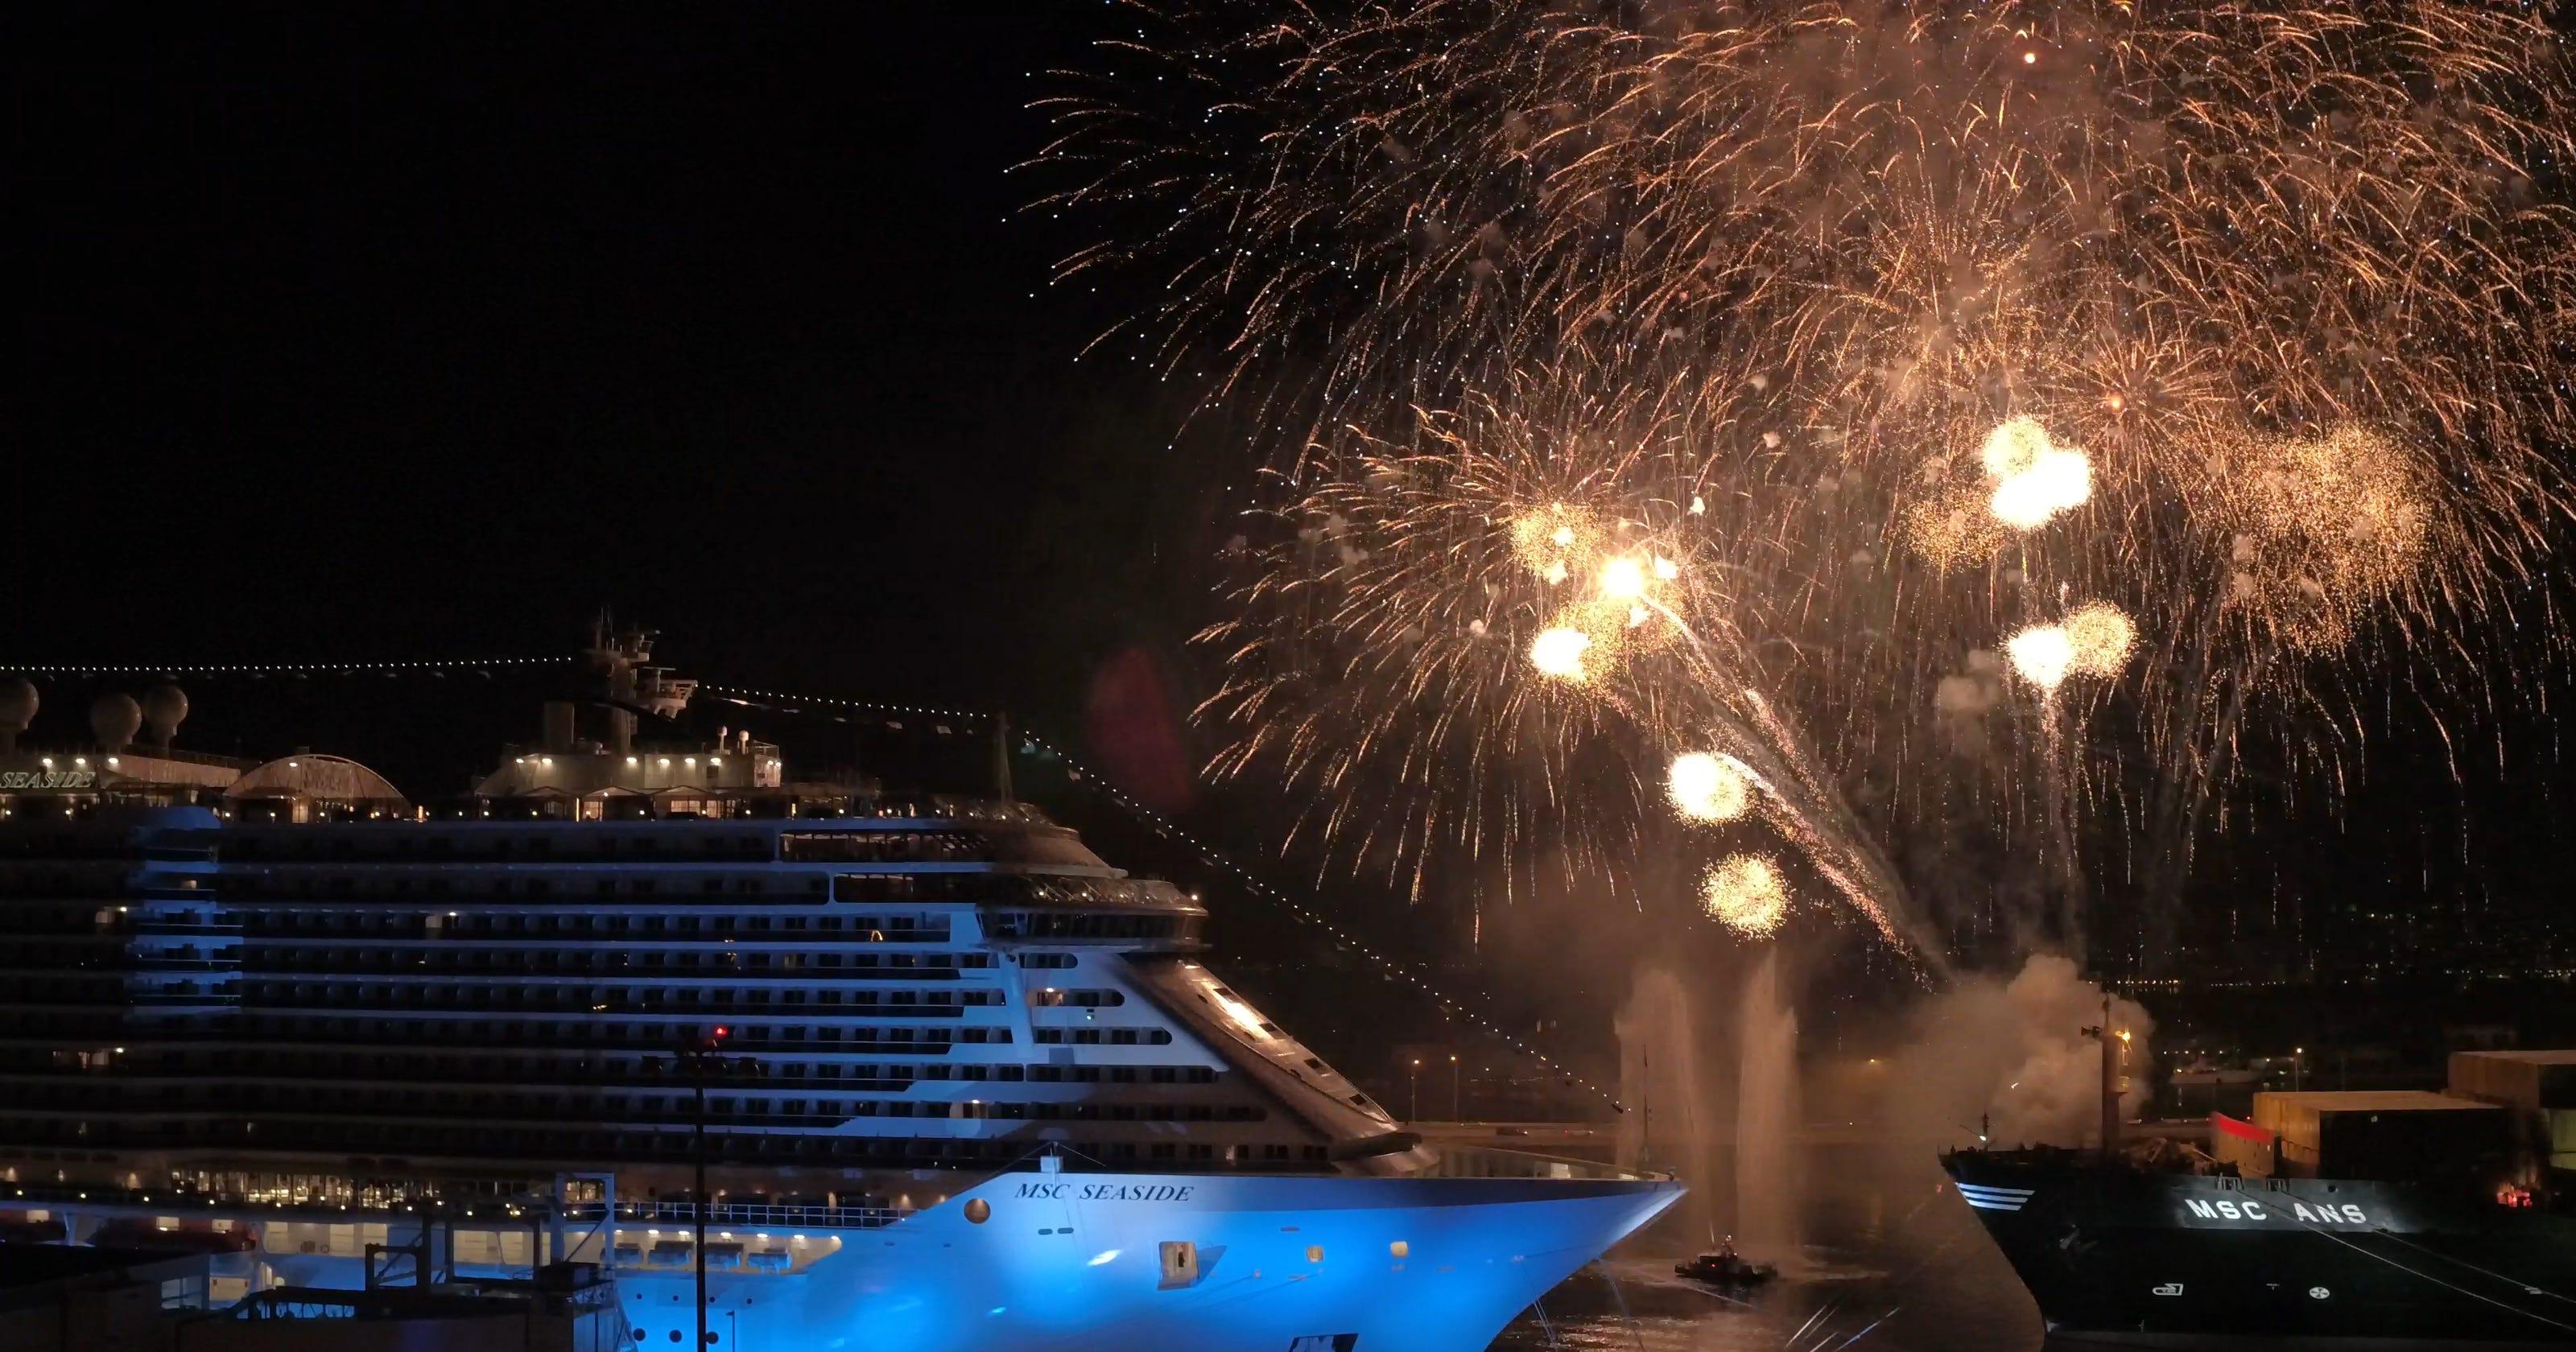 MSC Seaside: New cruise ship christened in Miami